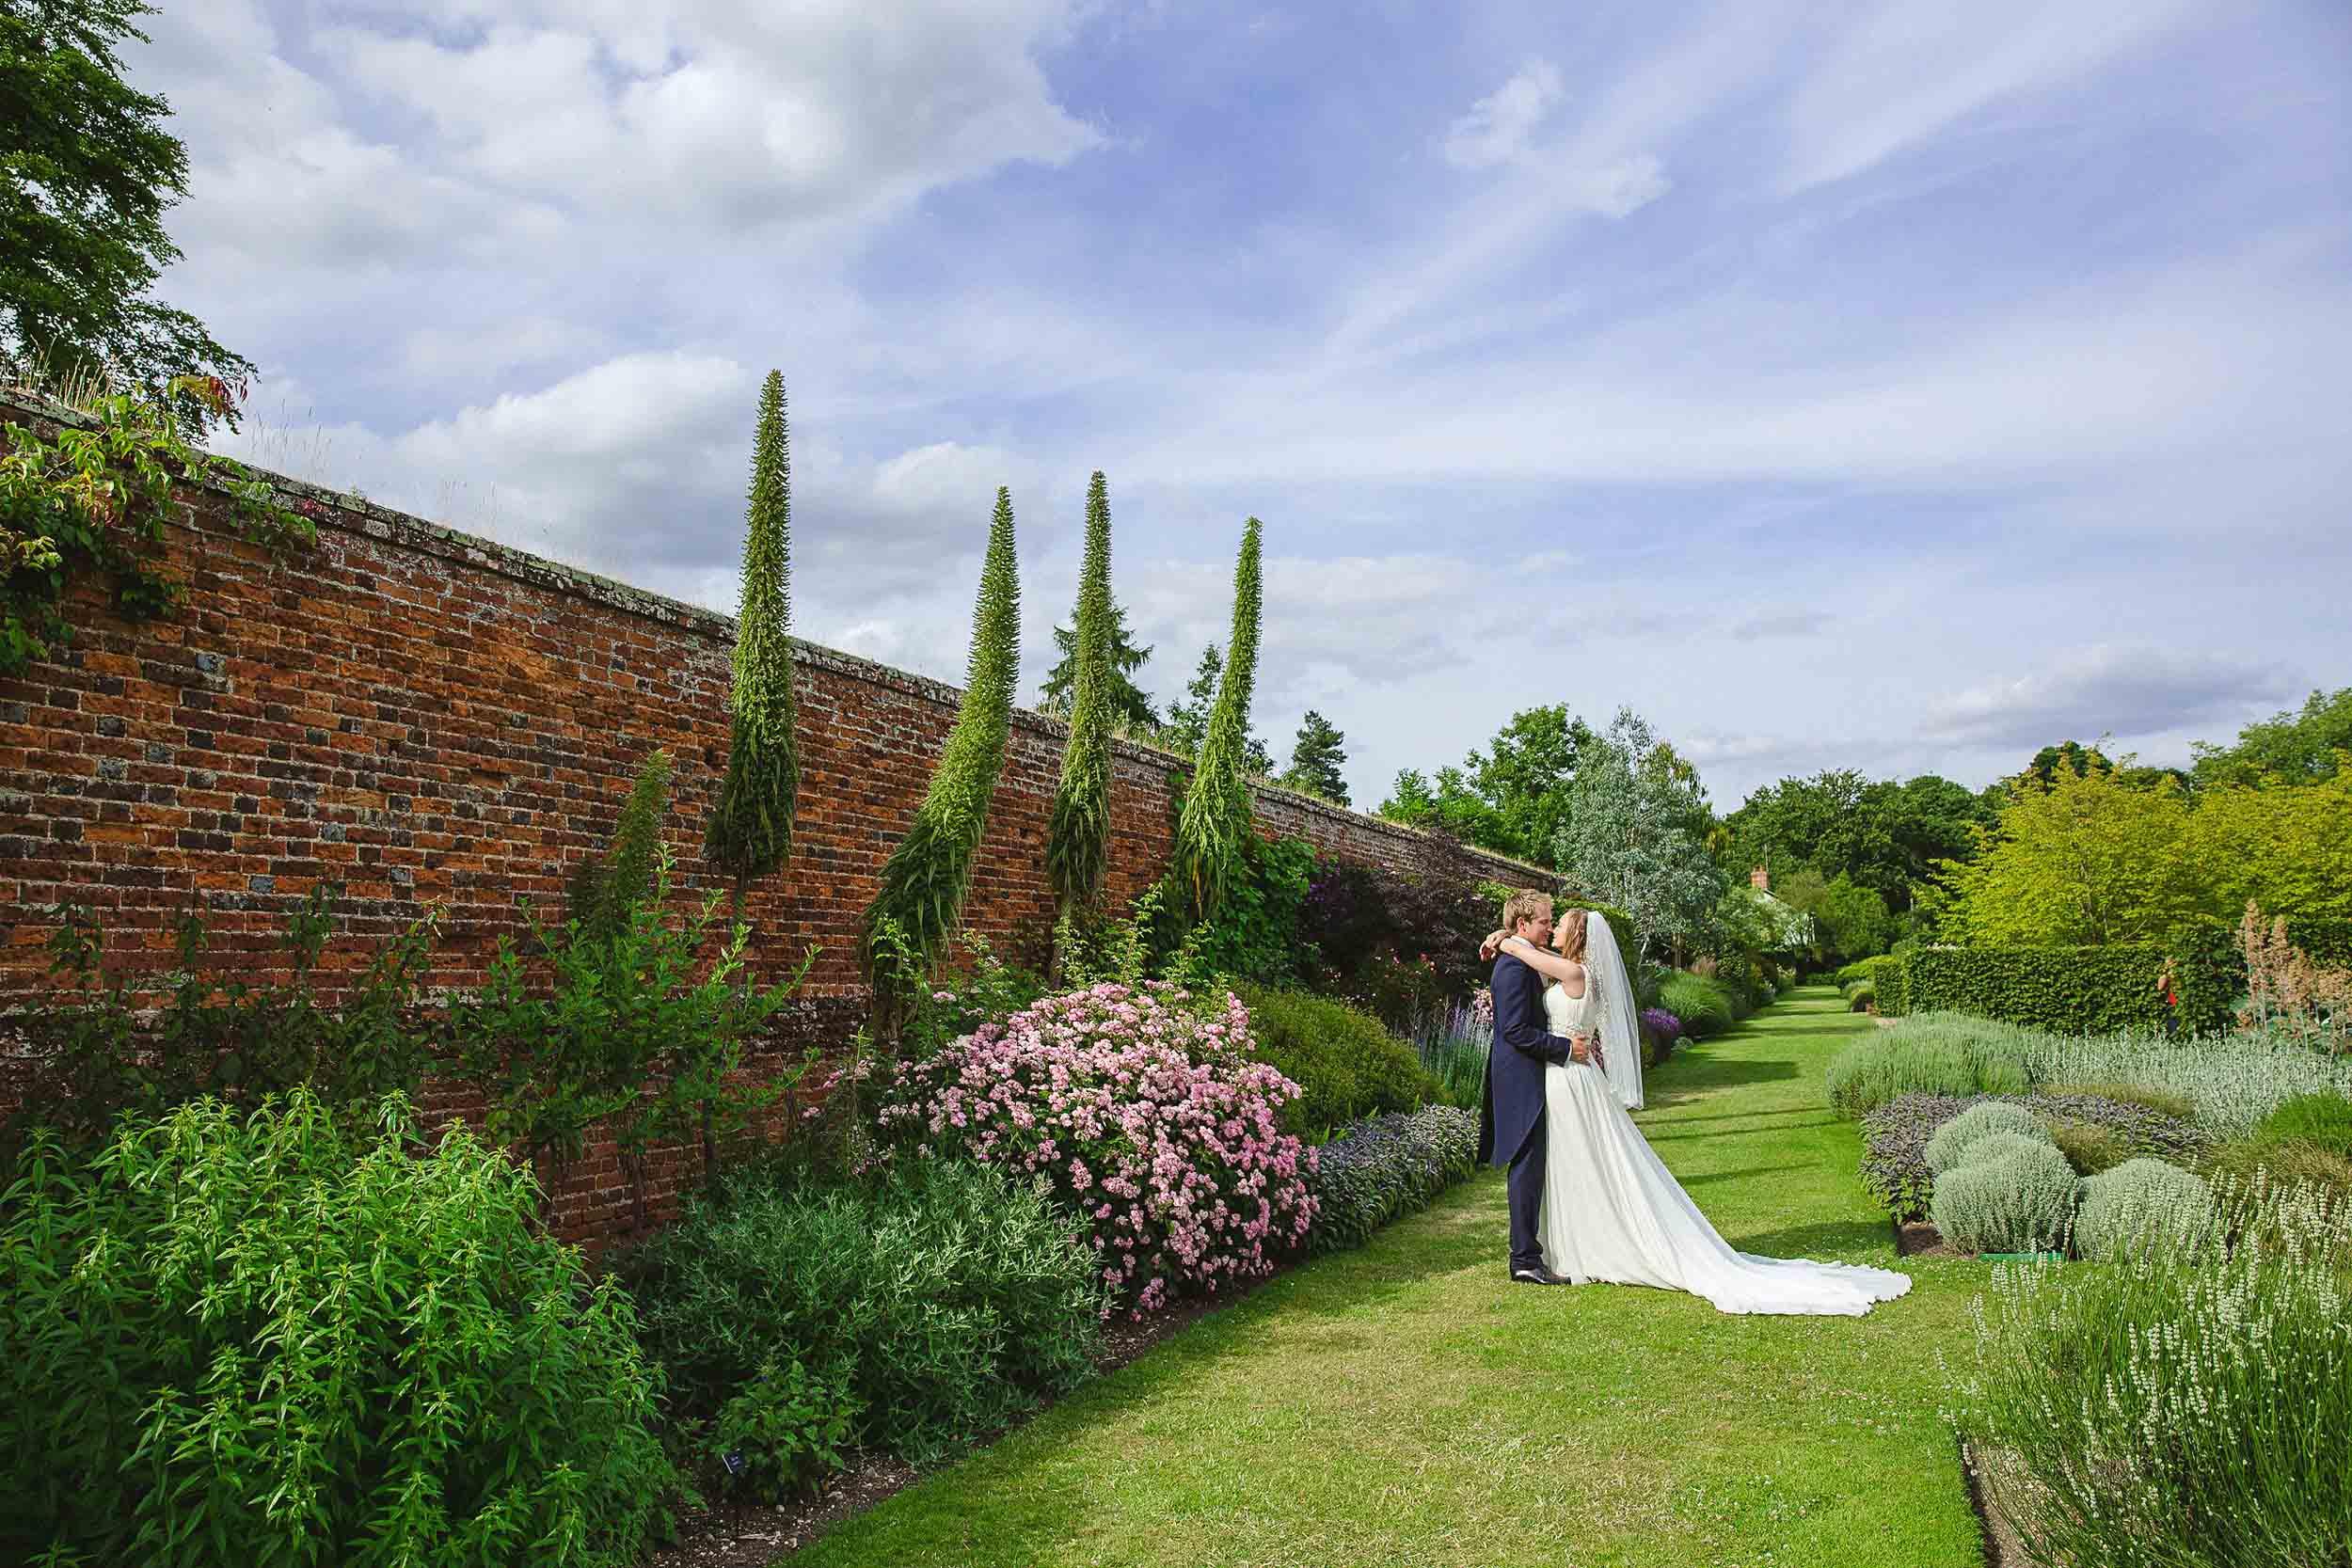 Marks-Hall-Wedding-Photographer-46.jpg